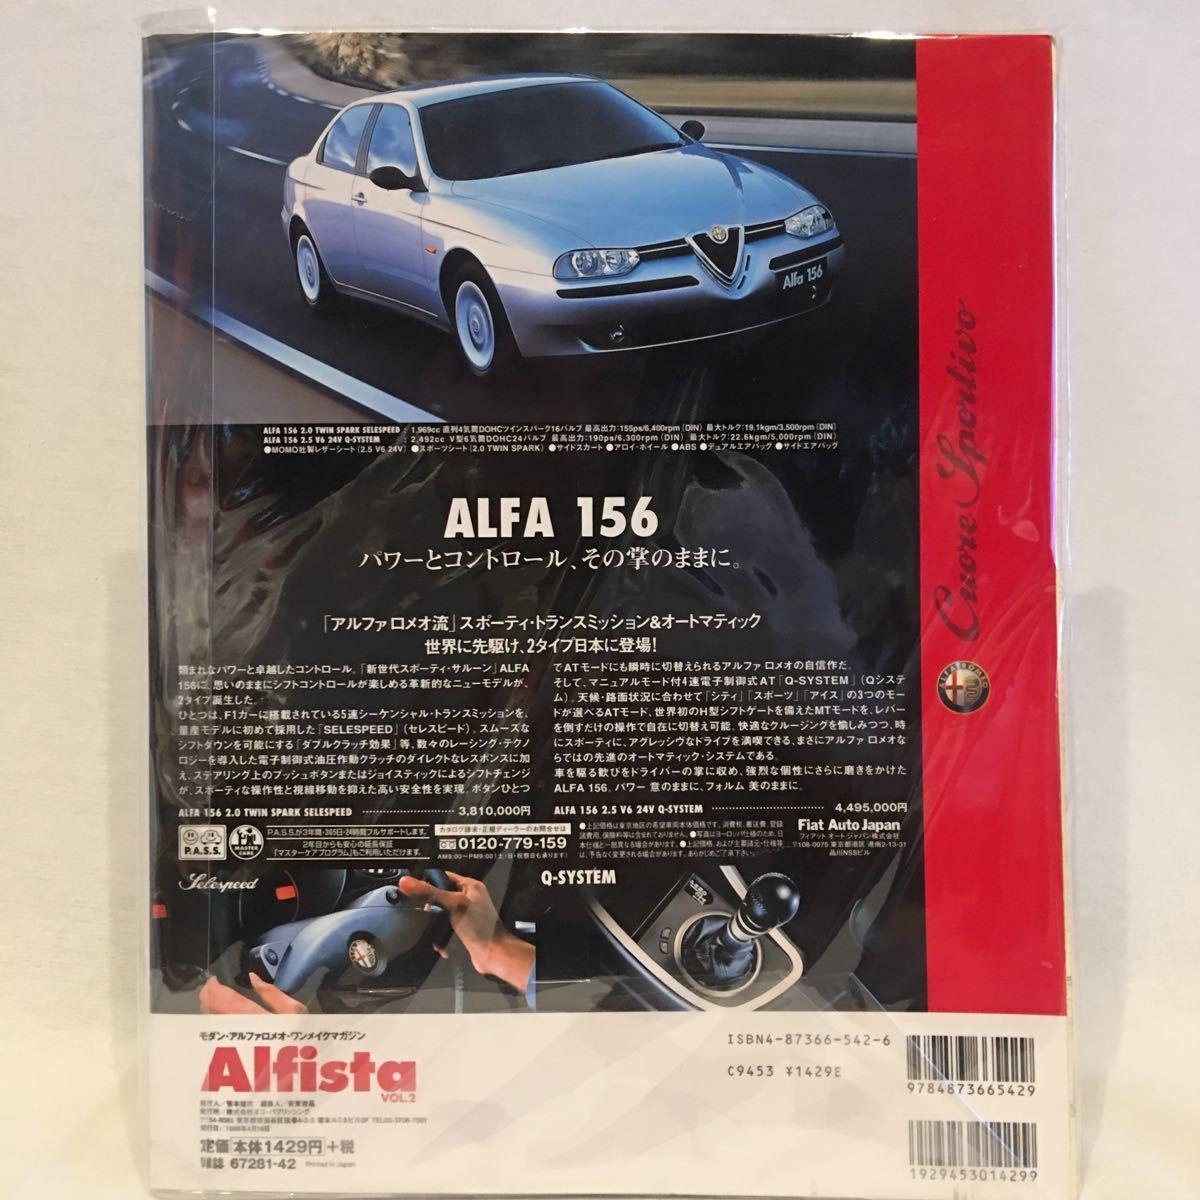 Alfista vol.2 アルファロメオ マガジン アルフィスタ Alfa 156 セレスピード 本 156 155 GTV 145 スパイダー_画像2